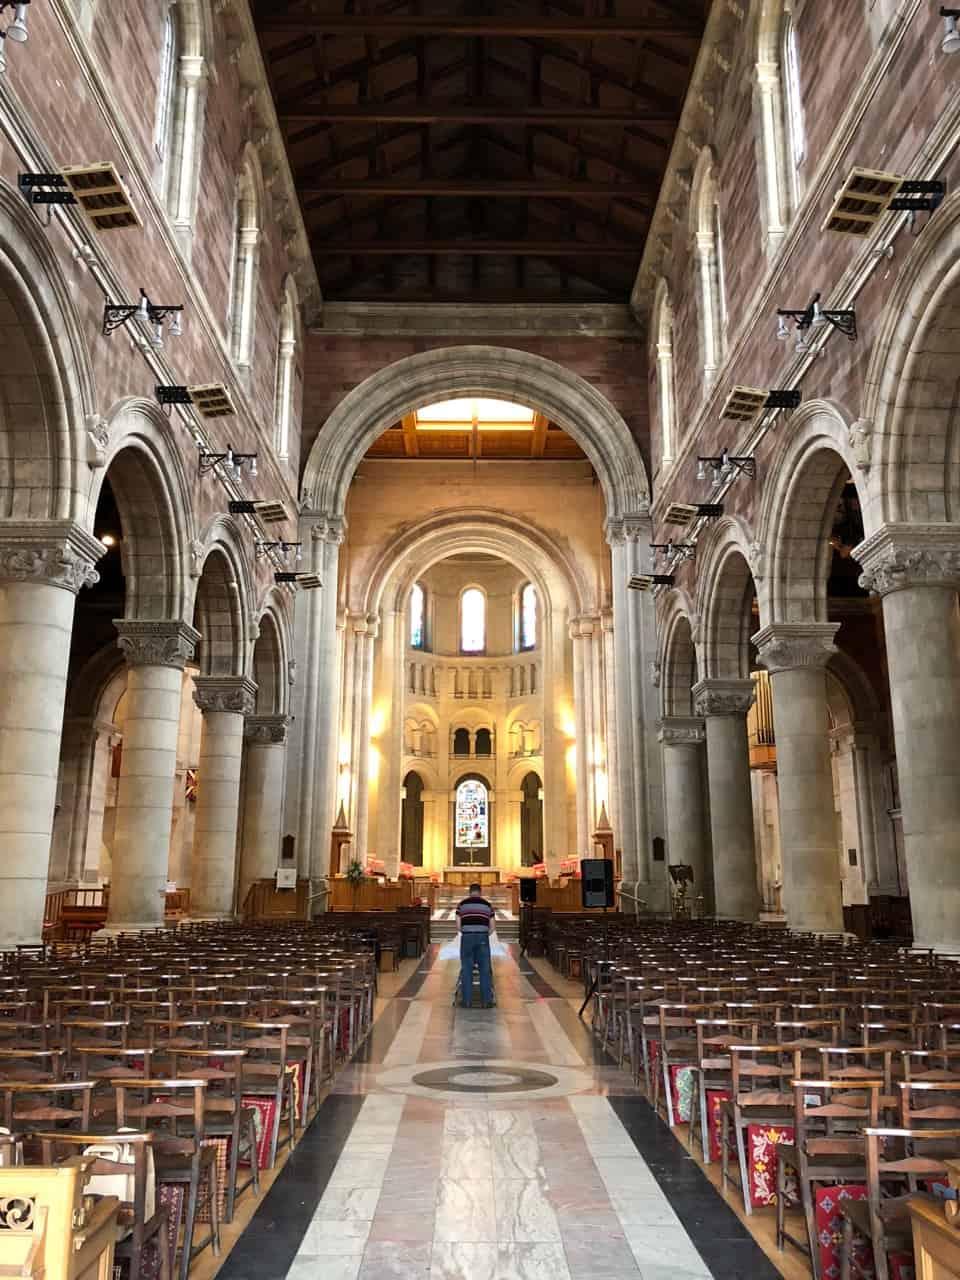 st-annes-cathedral-belfast-interior-photo